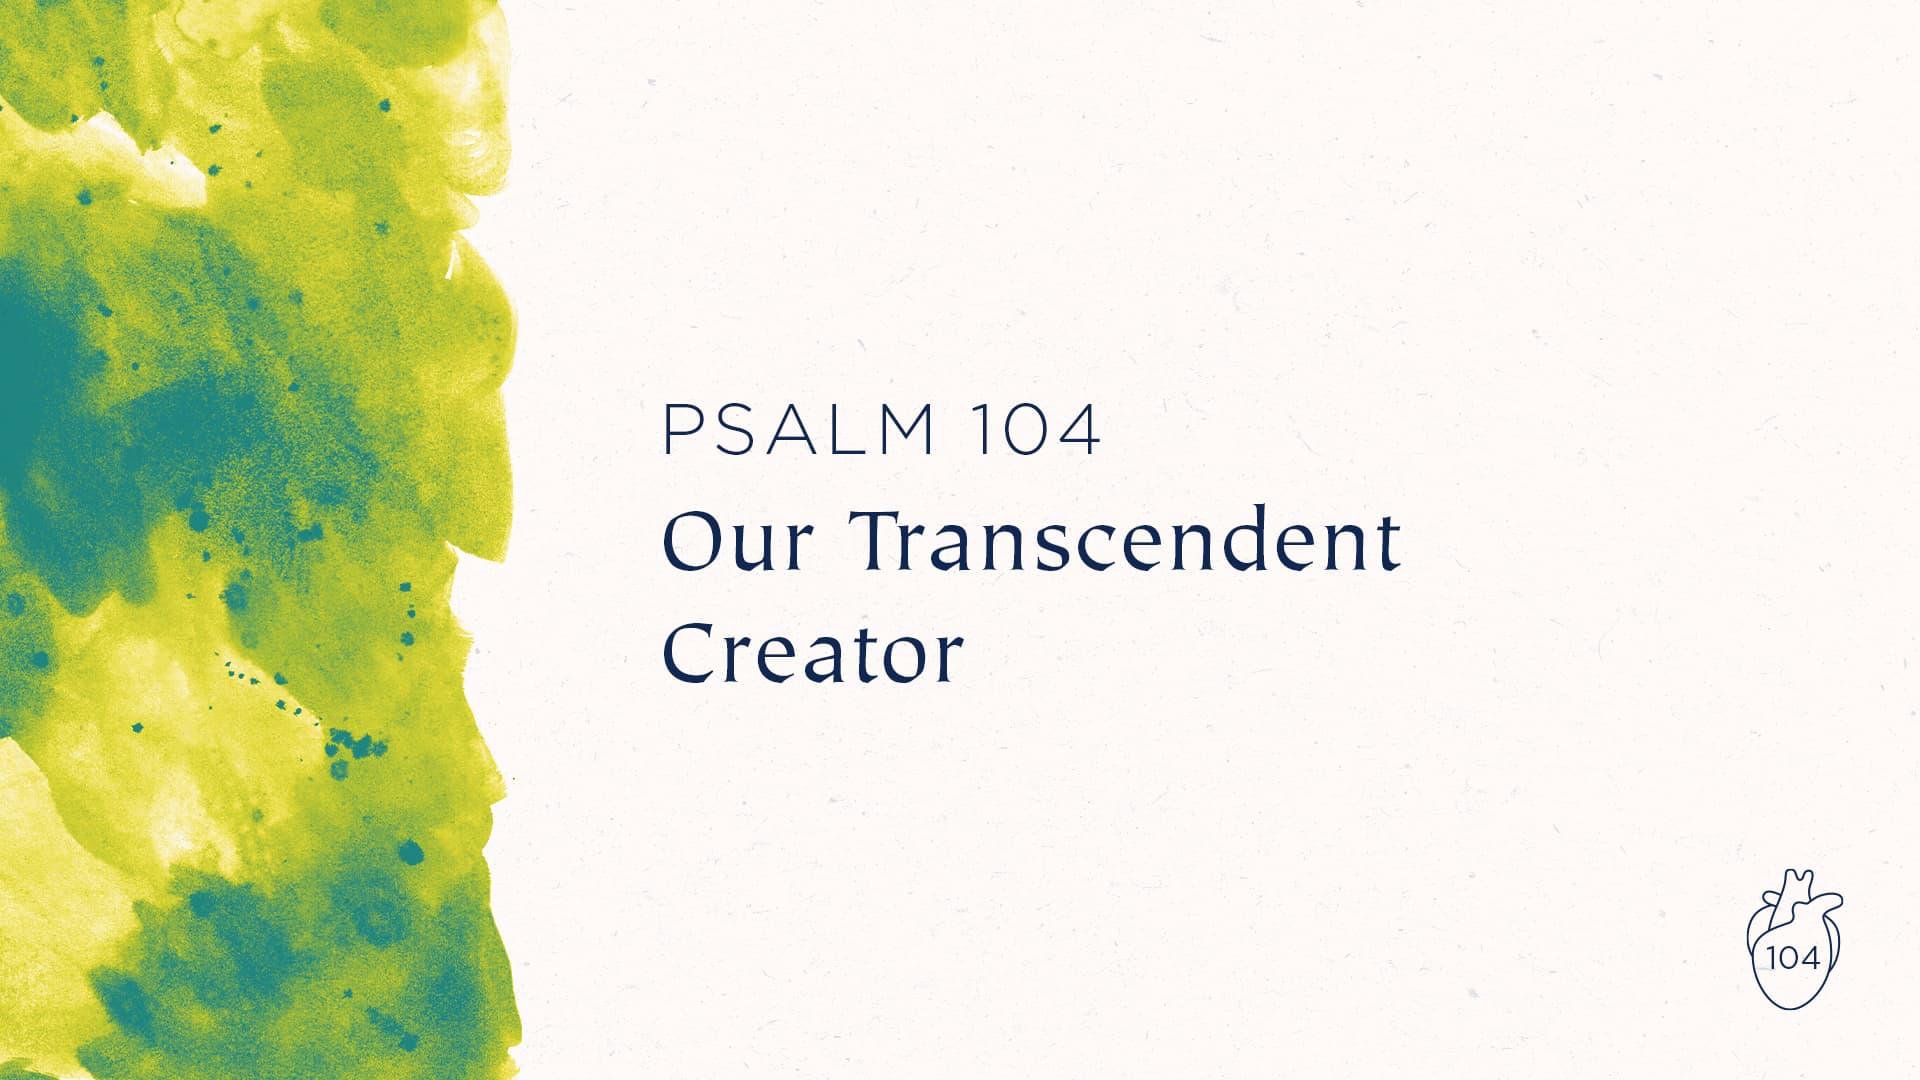 Our Transcendent Creator